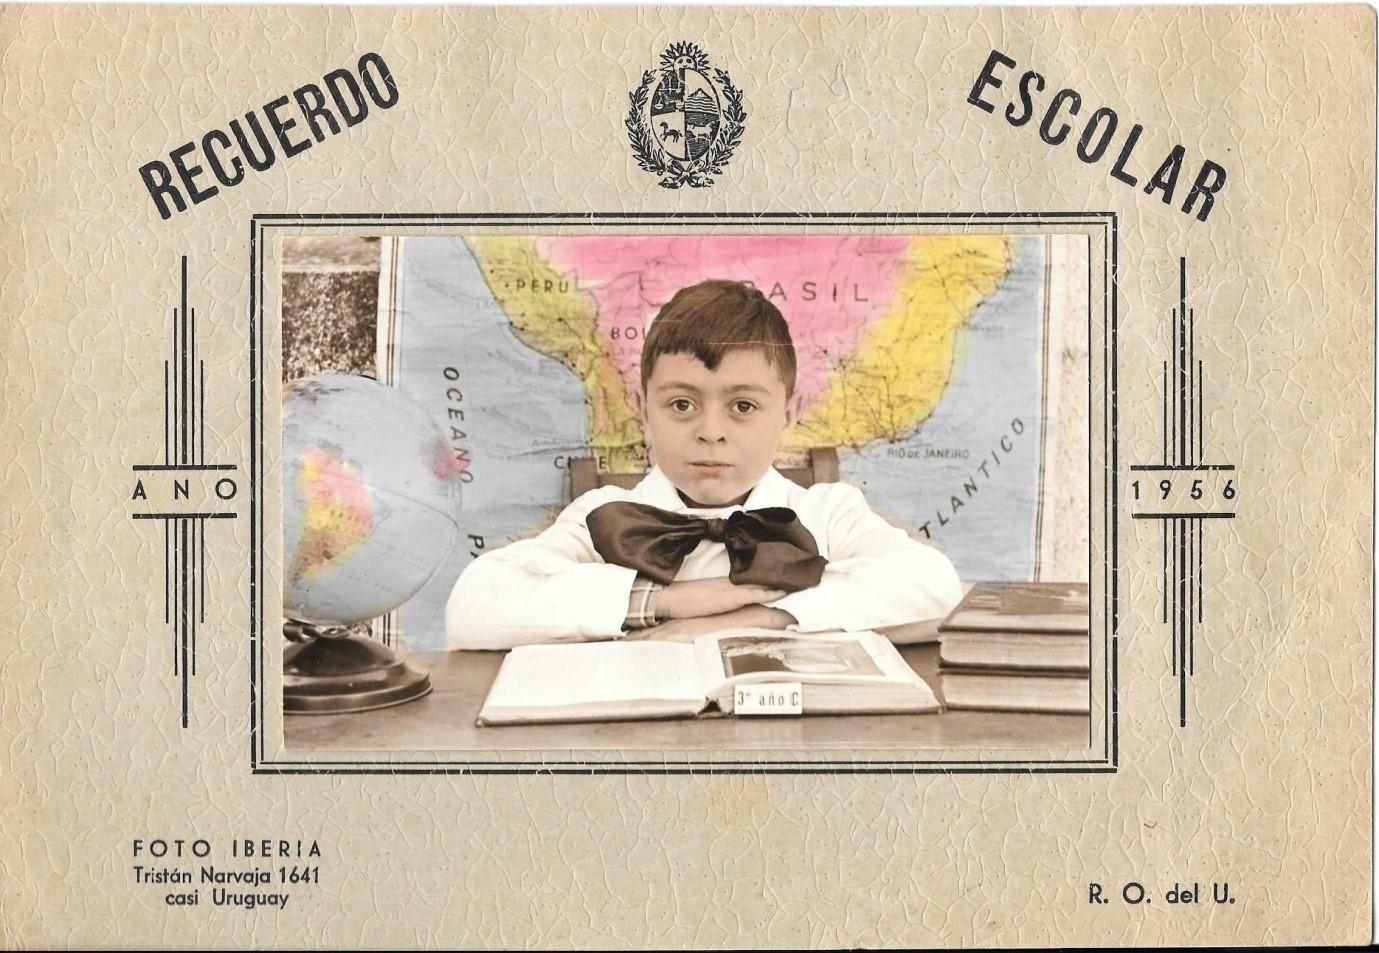 [Leon at the age of 8 in school uniform in Uruguay.]